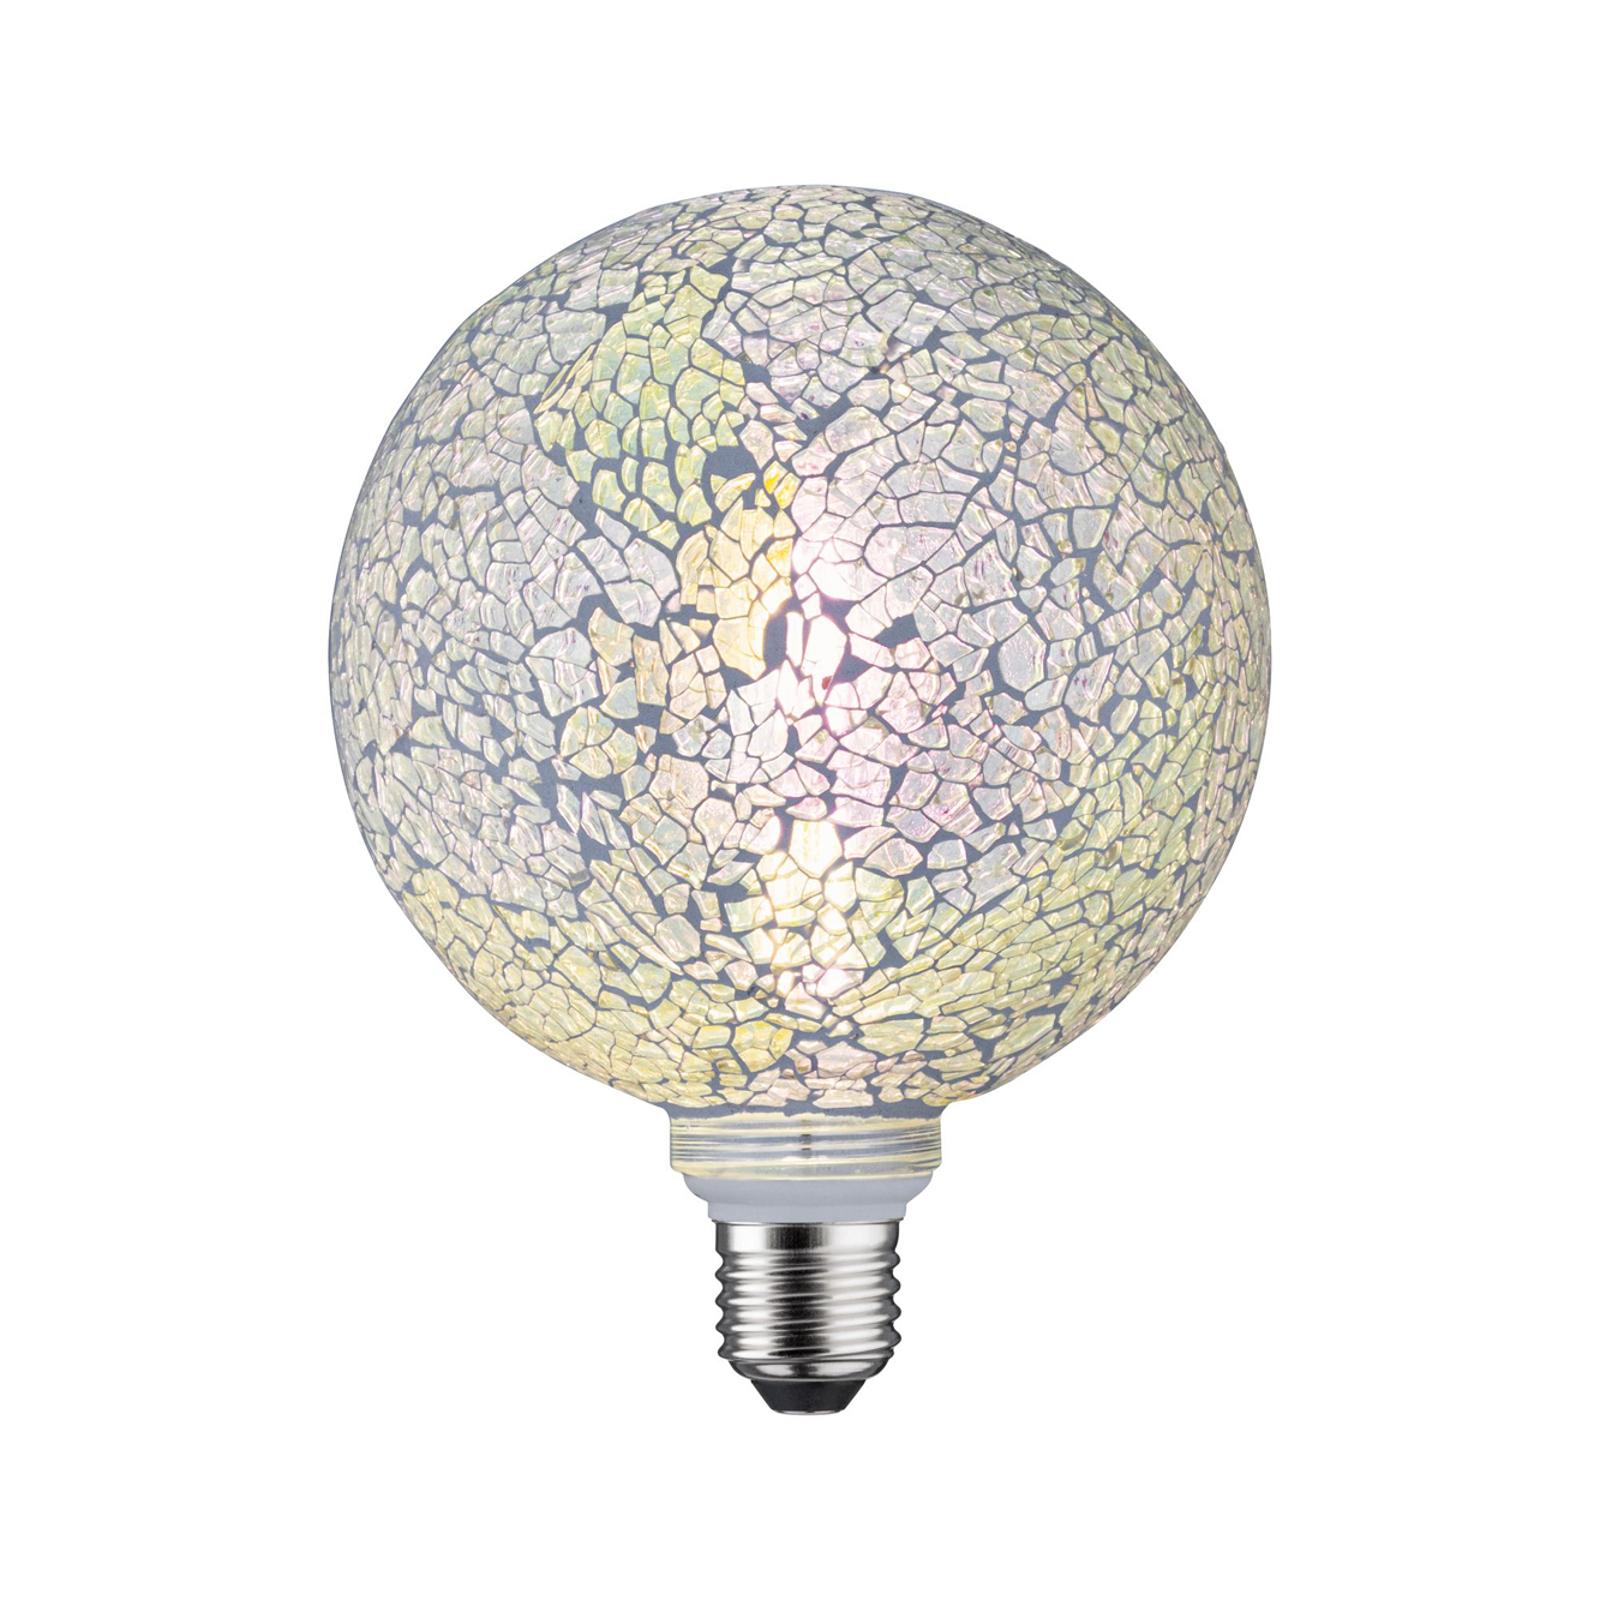 Paulmann E27 LED Globe 5 W Miracle Mosaic hvit